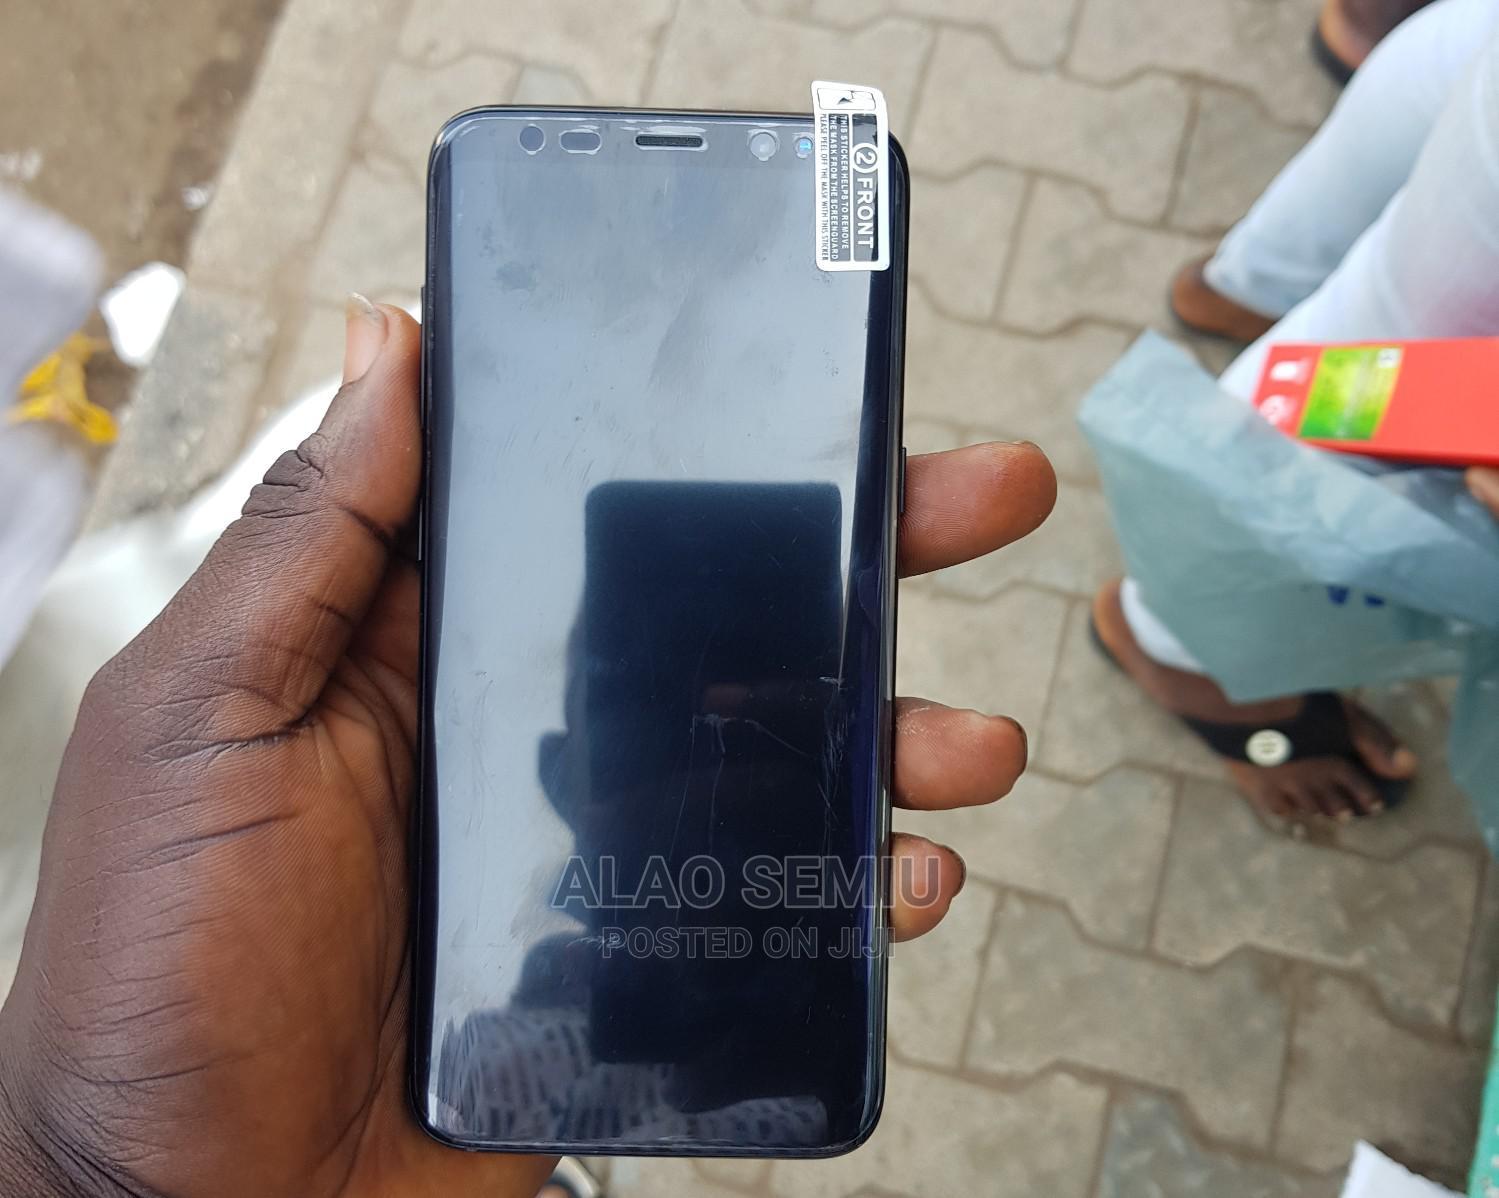 Samsung Galaxy S8 64 GB Black | Mobile Phones for sale in Ilorin West, Kwara State, Nigeria